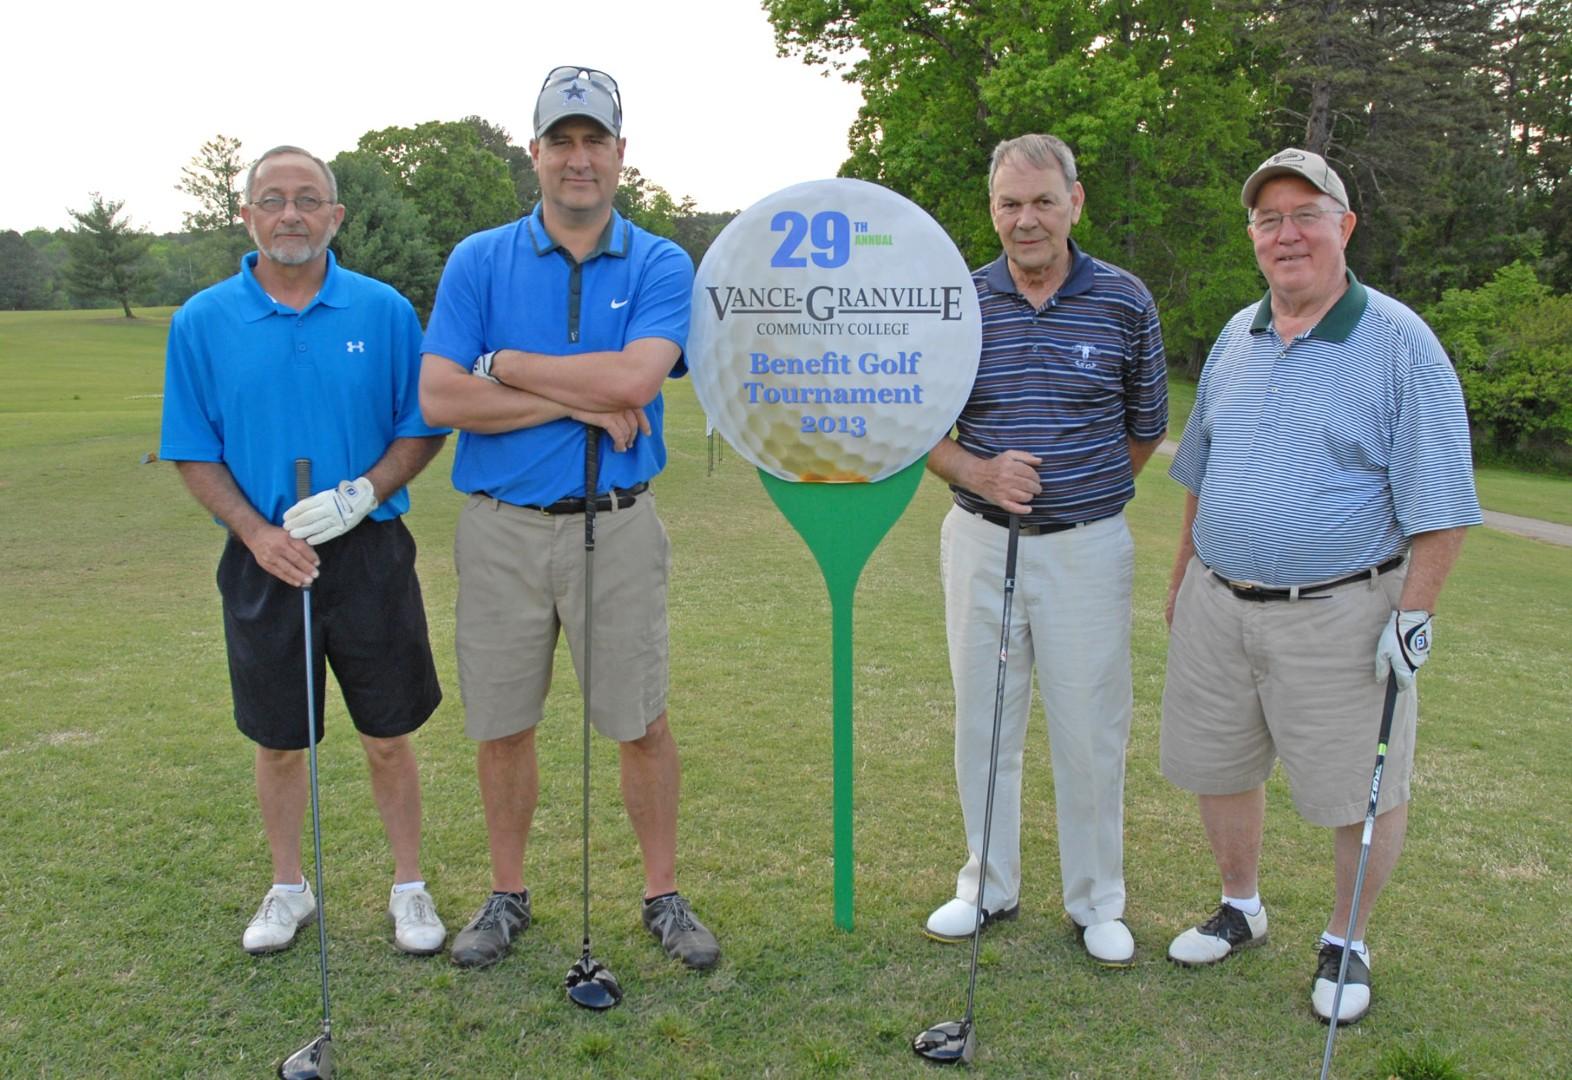 VGCC celebrates another Record-Setting Benefit Golf Tournament